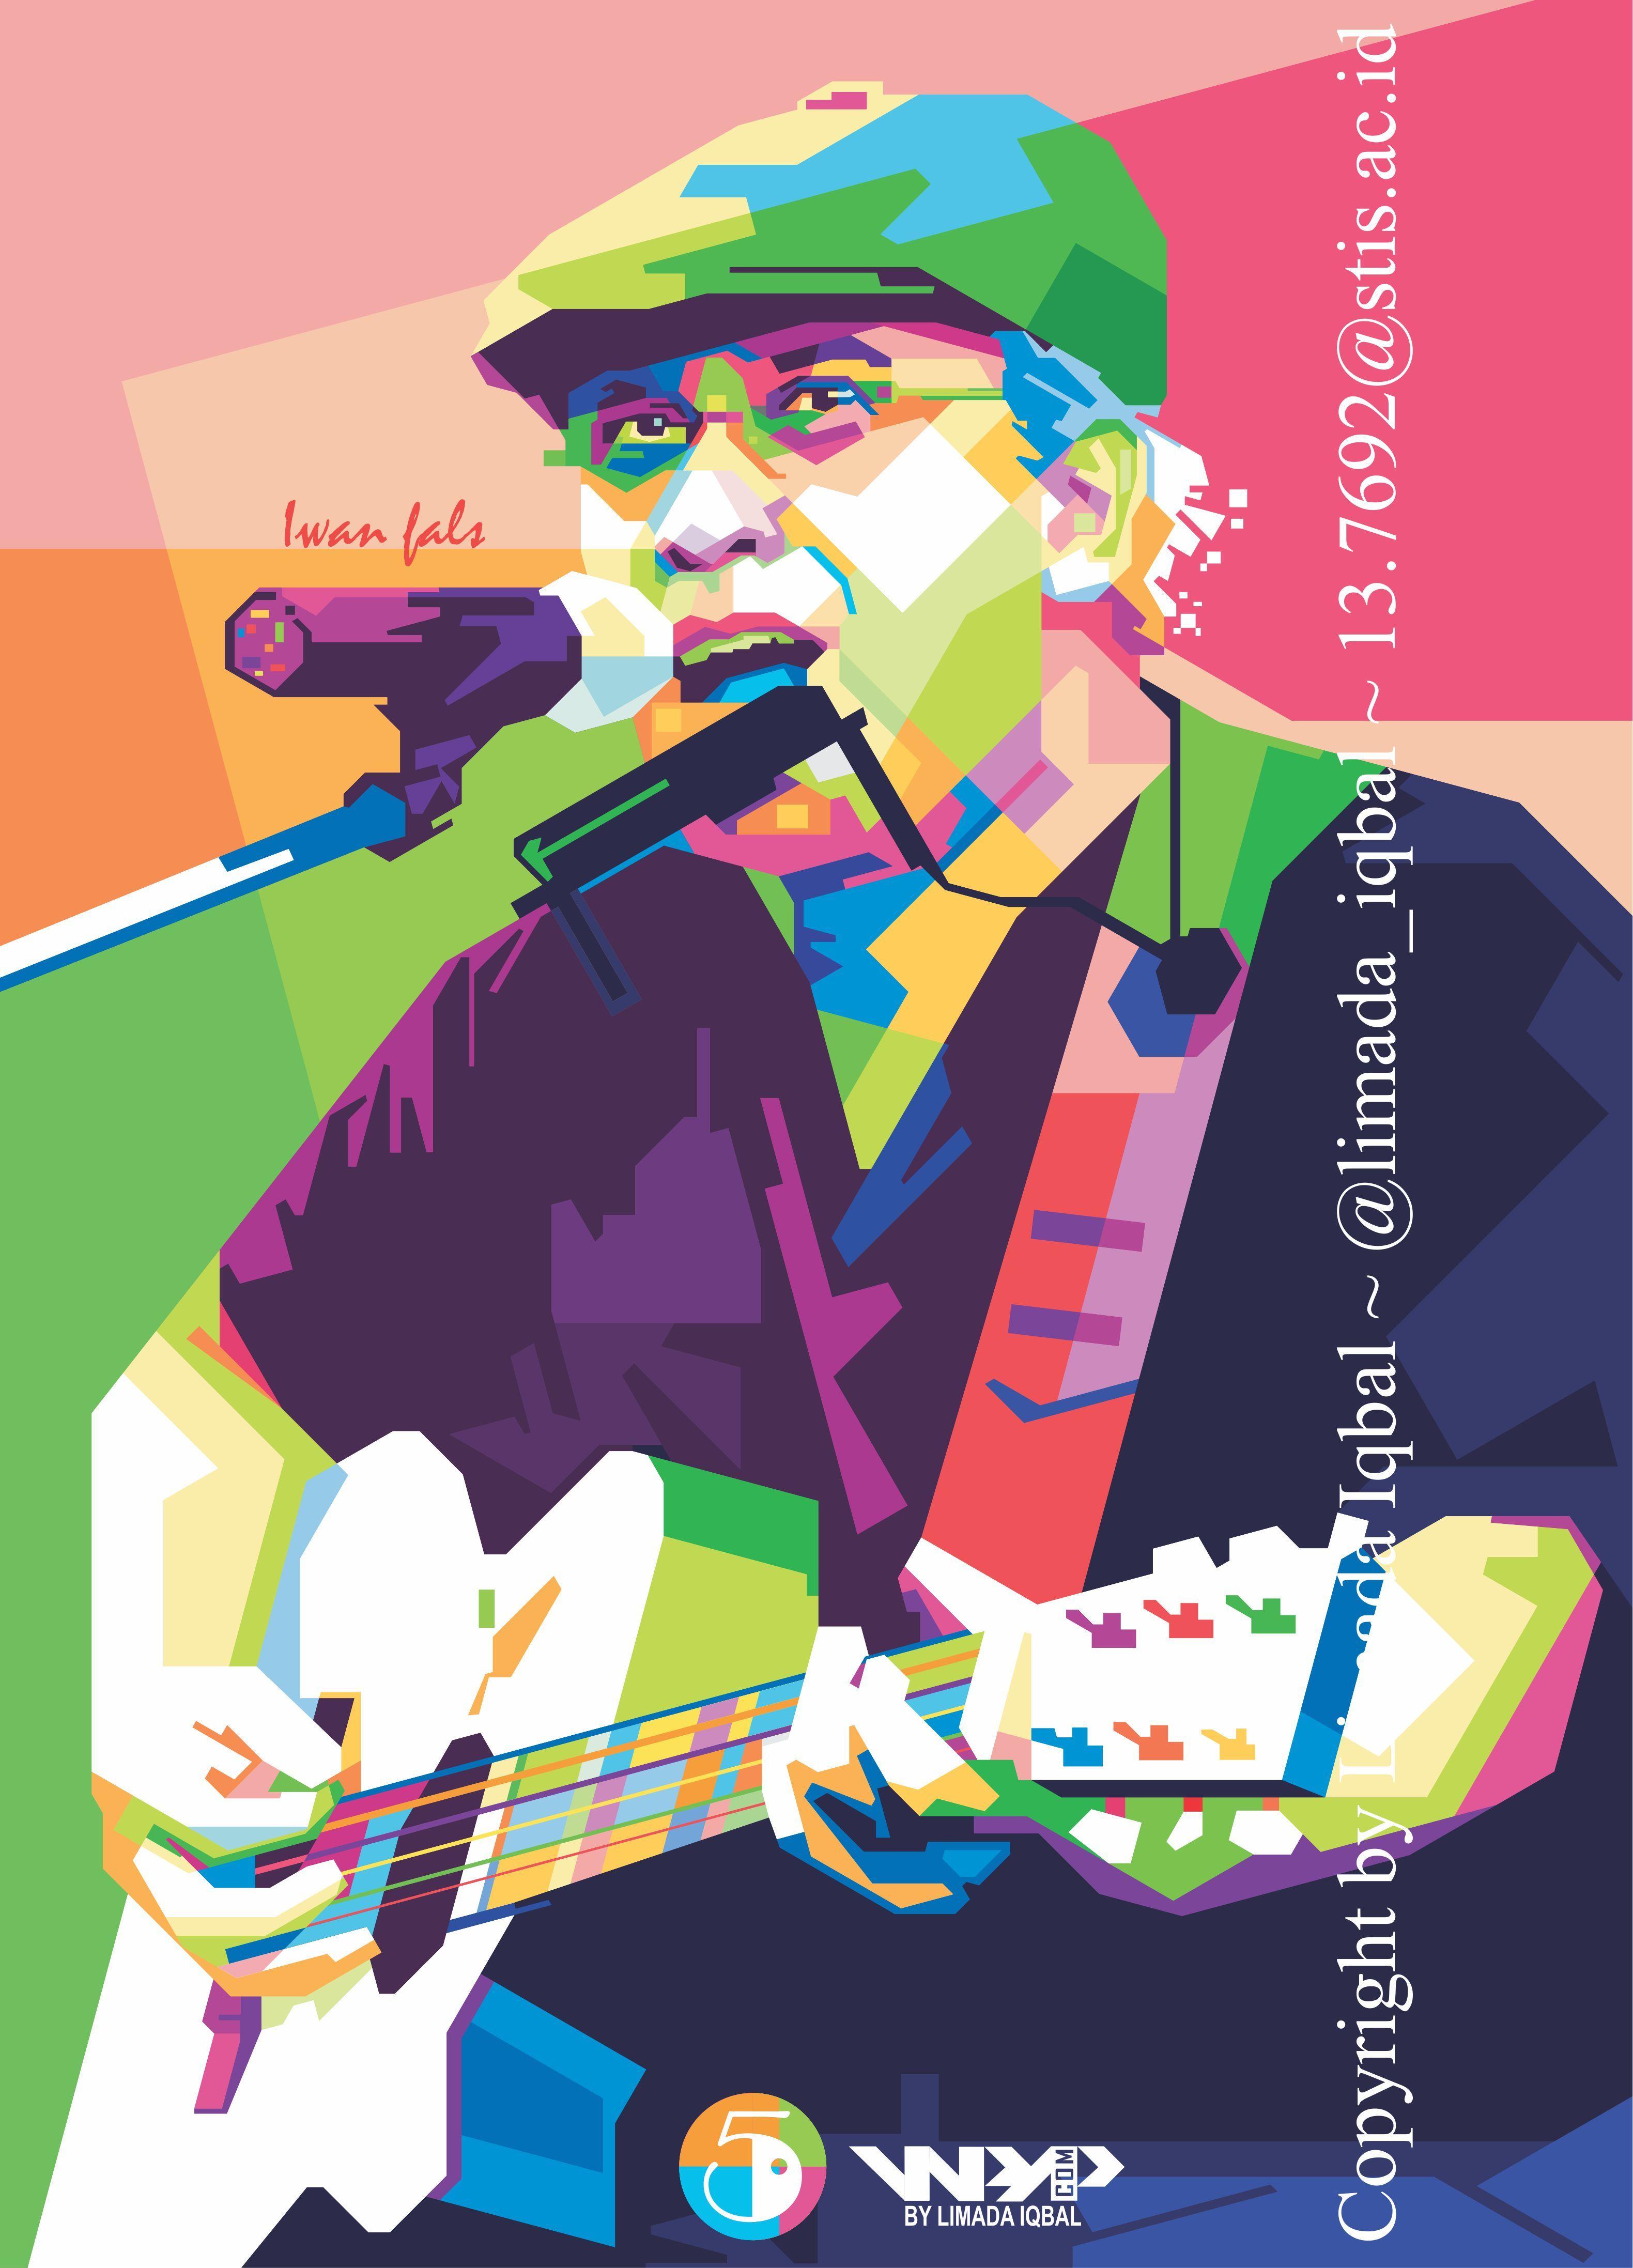 Vector Iwan Fals : vector, Iwanfals, #wpap, #illustrator, #vector, #singer, #indonesia, #fullcolor